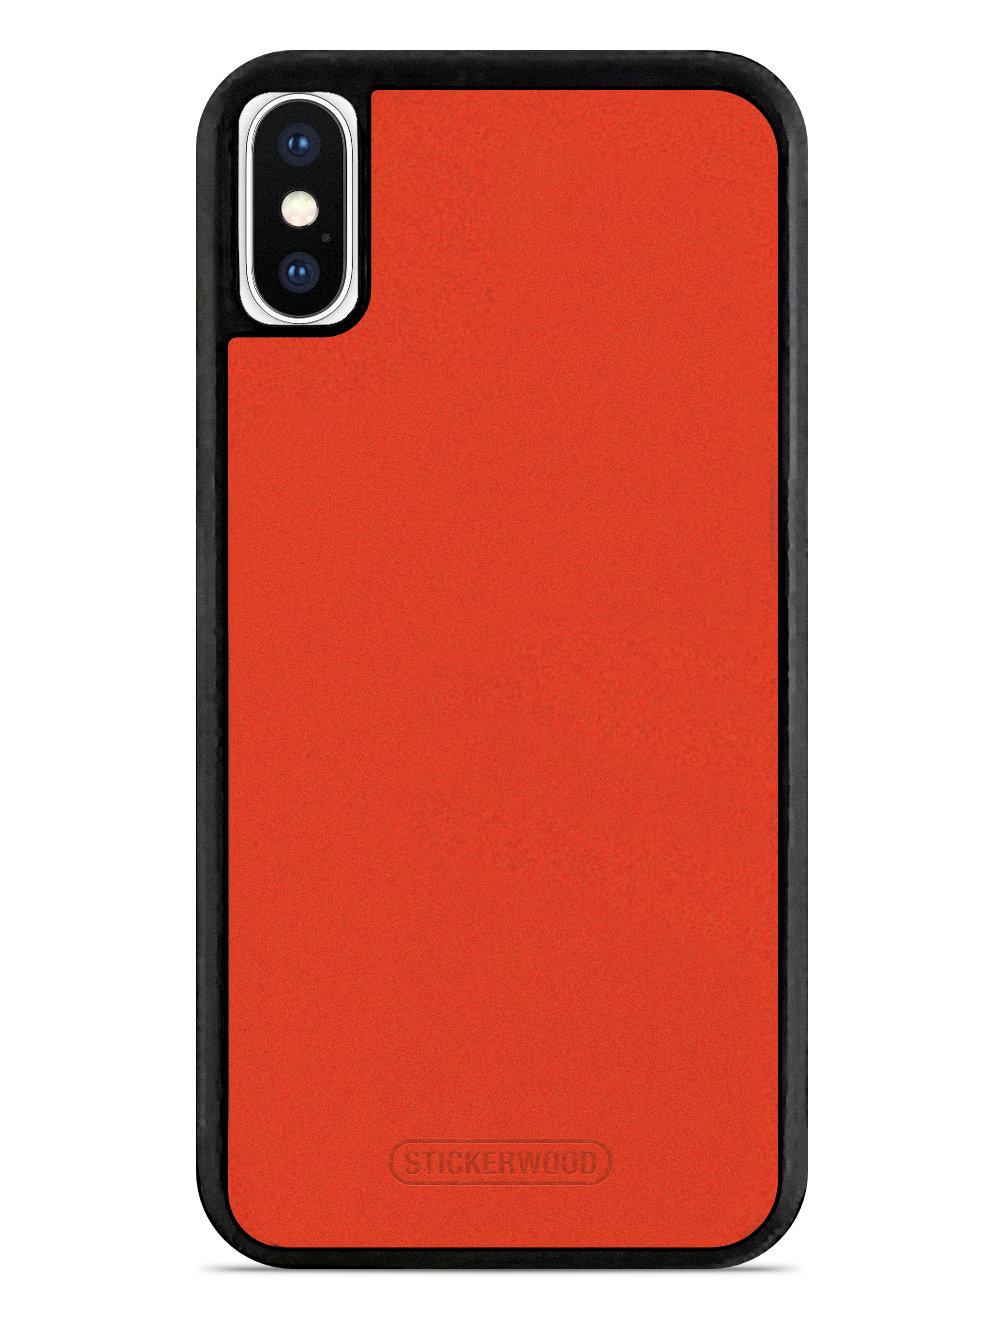 Stickerwood Signal Red